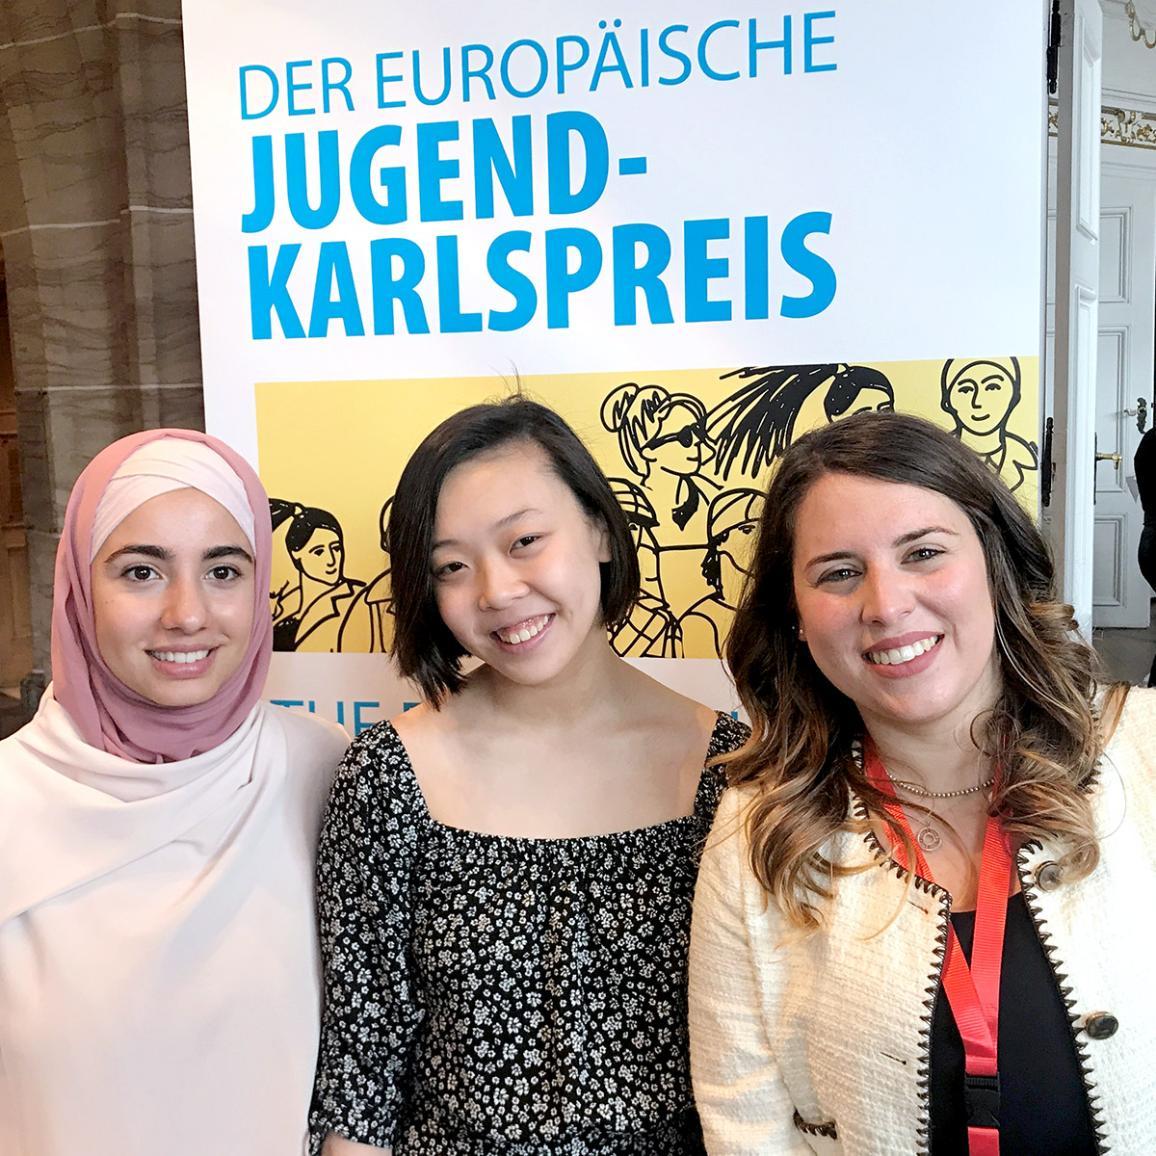 Canan Yasar (Muslims against Anti-Semitism); Yannika Ronnqvist (Your European Citizenship);  Sarah Penge, (Europhonica IT)